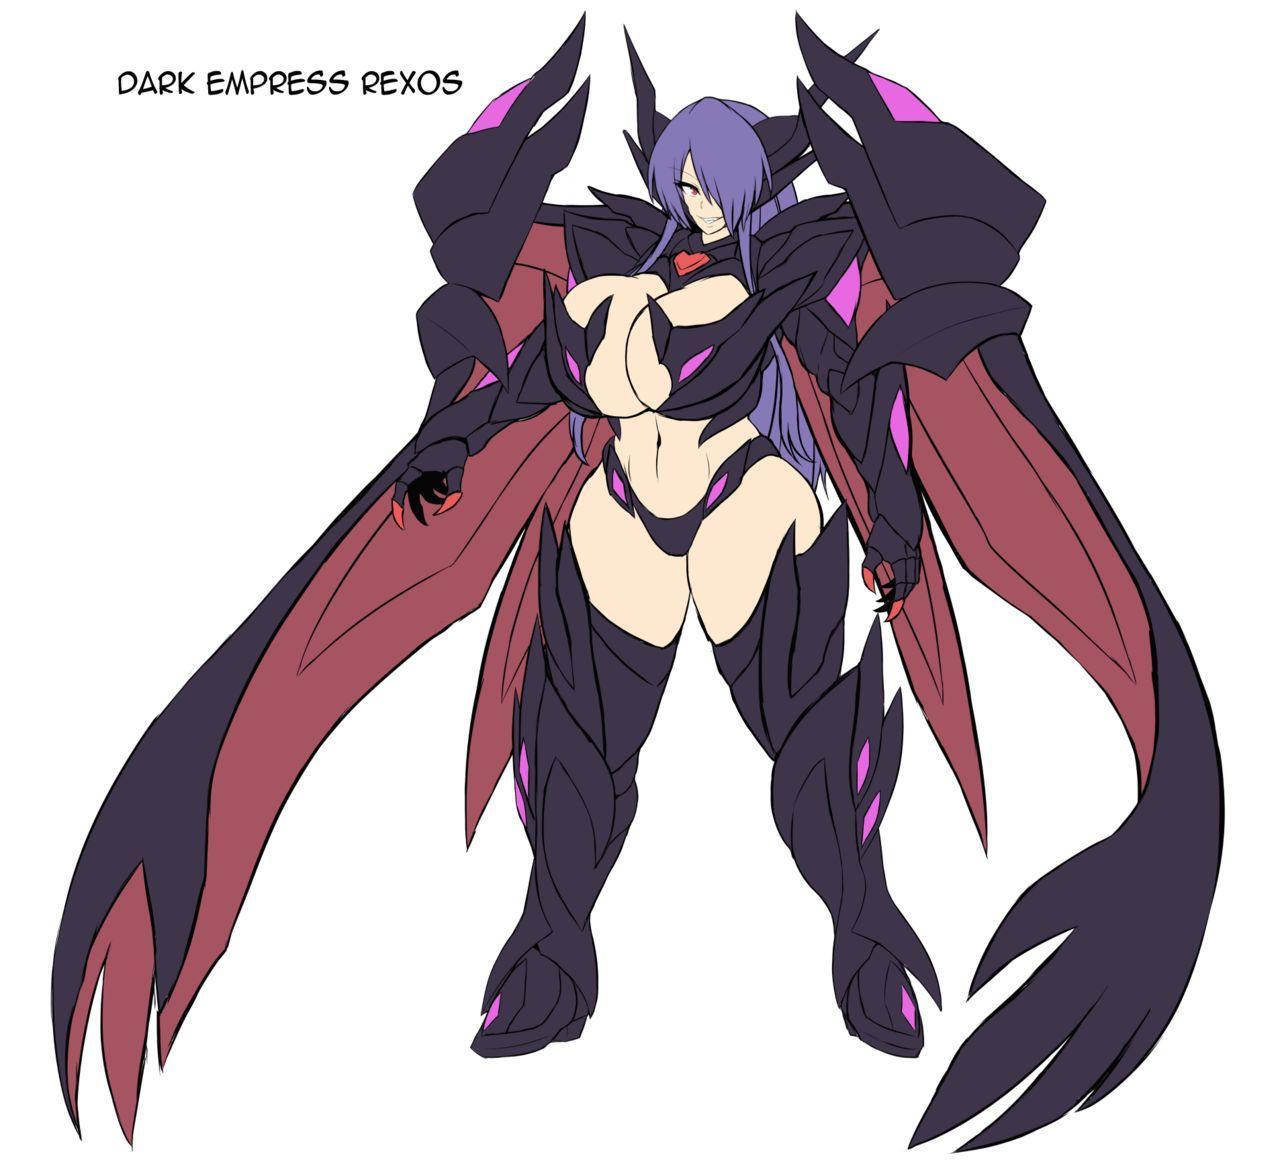 (C94) [Ikameshi Shokudou (Ikameshi)] Seisenki Iris 3 ~Inbinaru Shuuen~ | Battle Angel Iris 3 ~The End of Purity~ [English] {darknight} 31